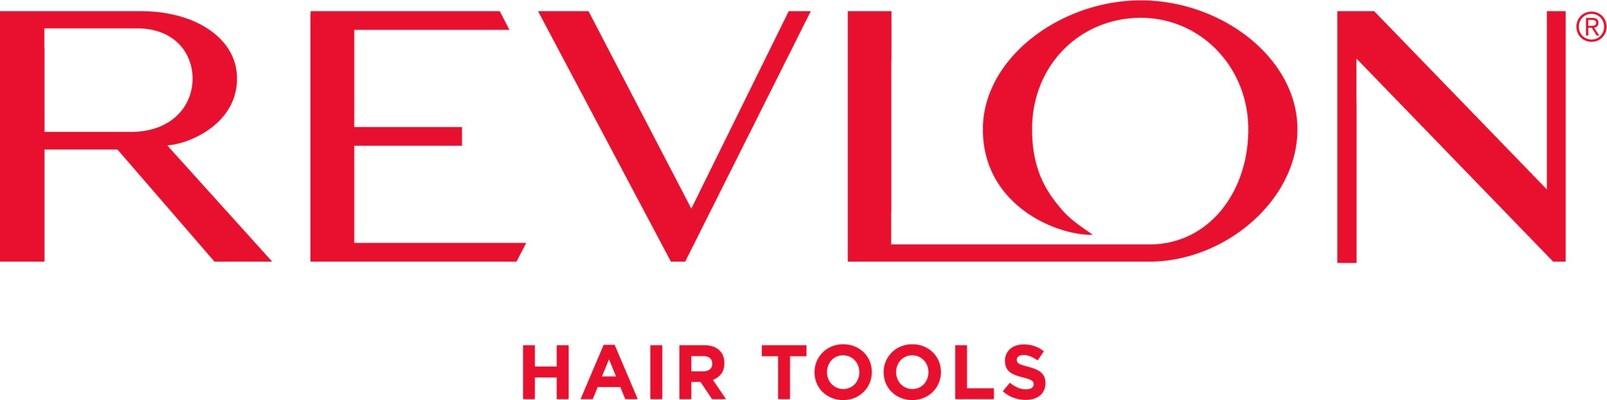 Revlon Hair Tools